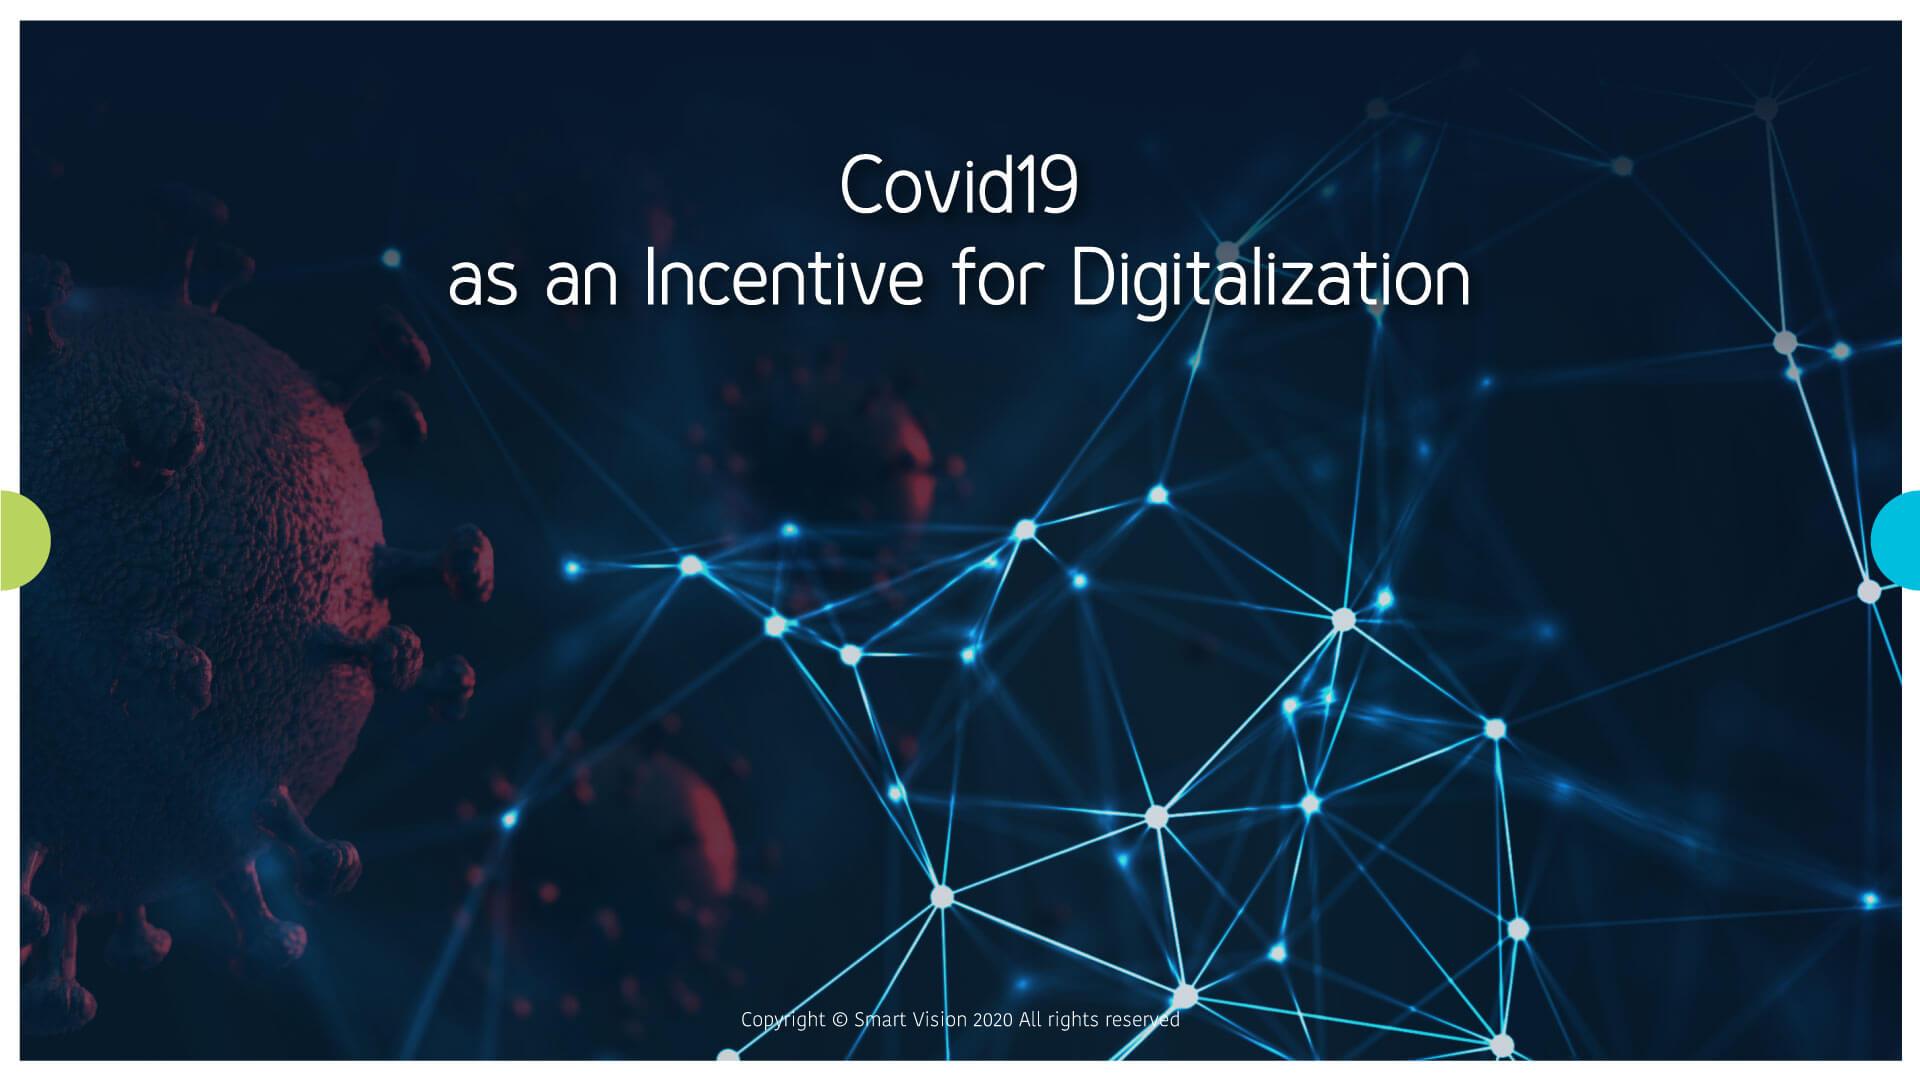 Smart Vison Blog - Covid19 As An Incentive For Digitalization